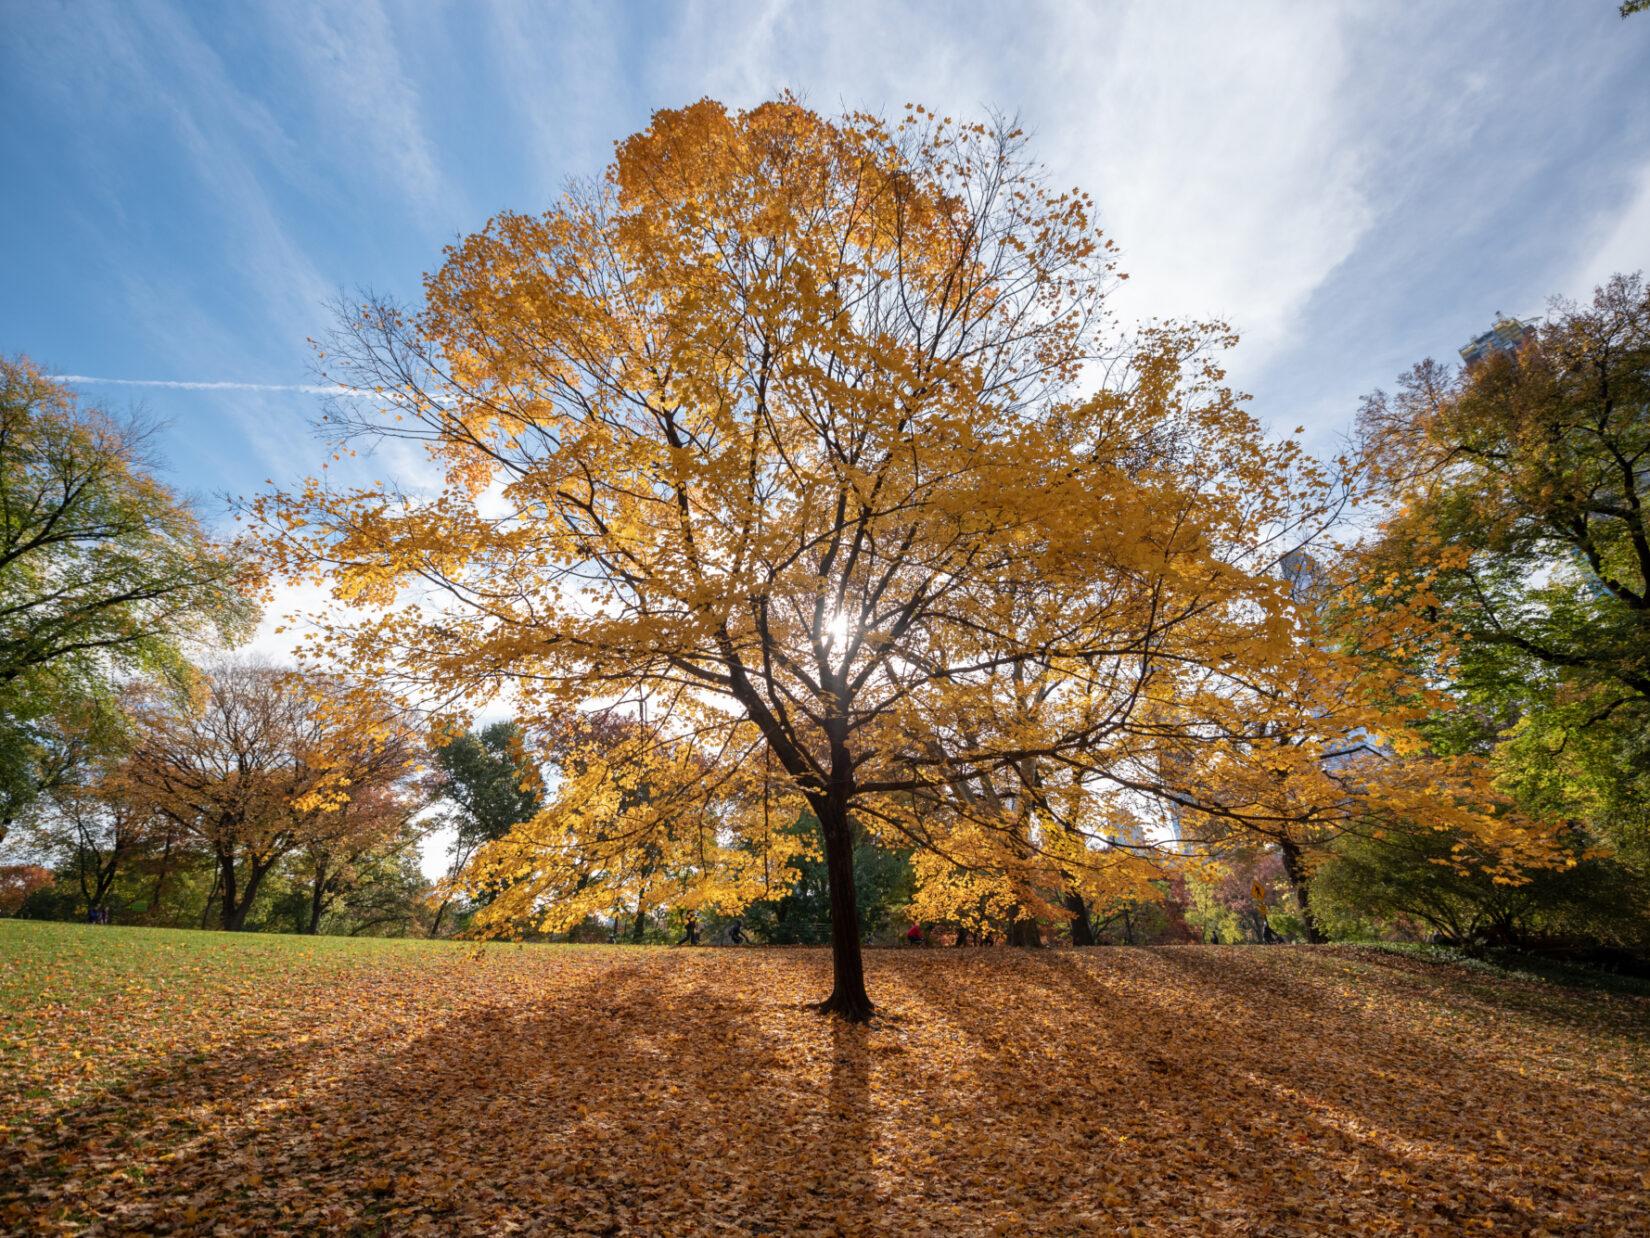 An autumn tree backlit by a brilliant blue fall sky.